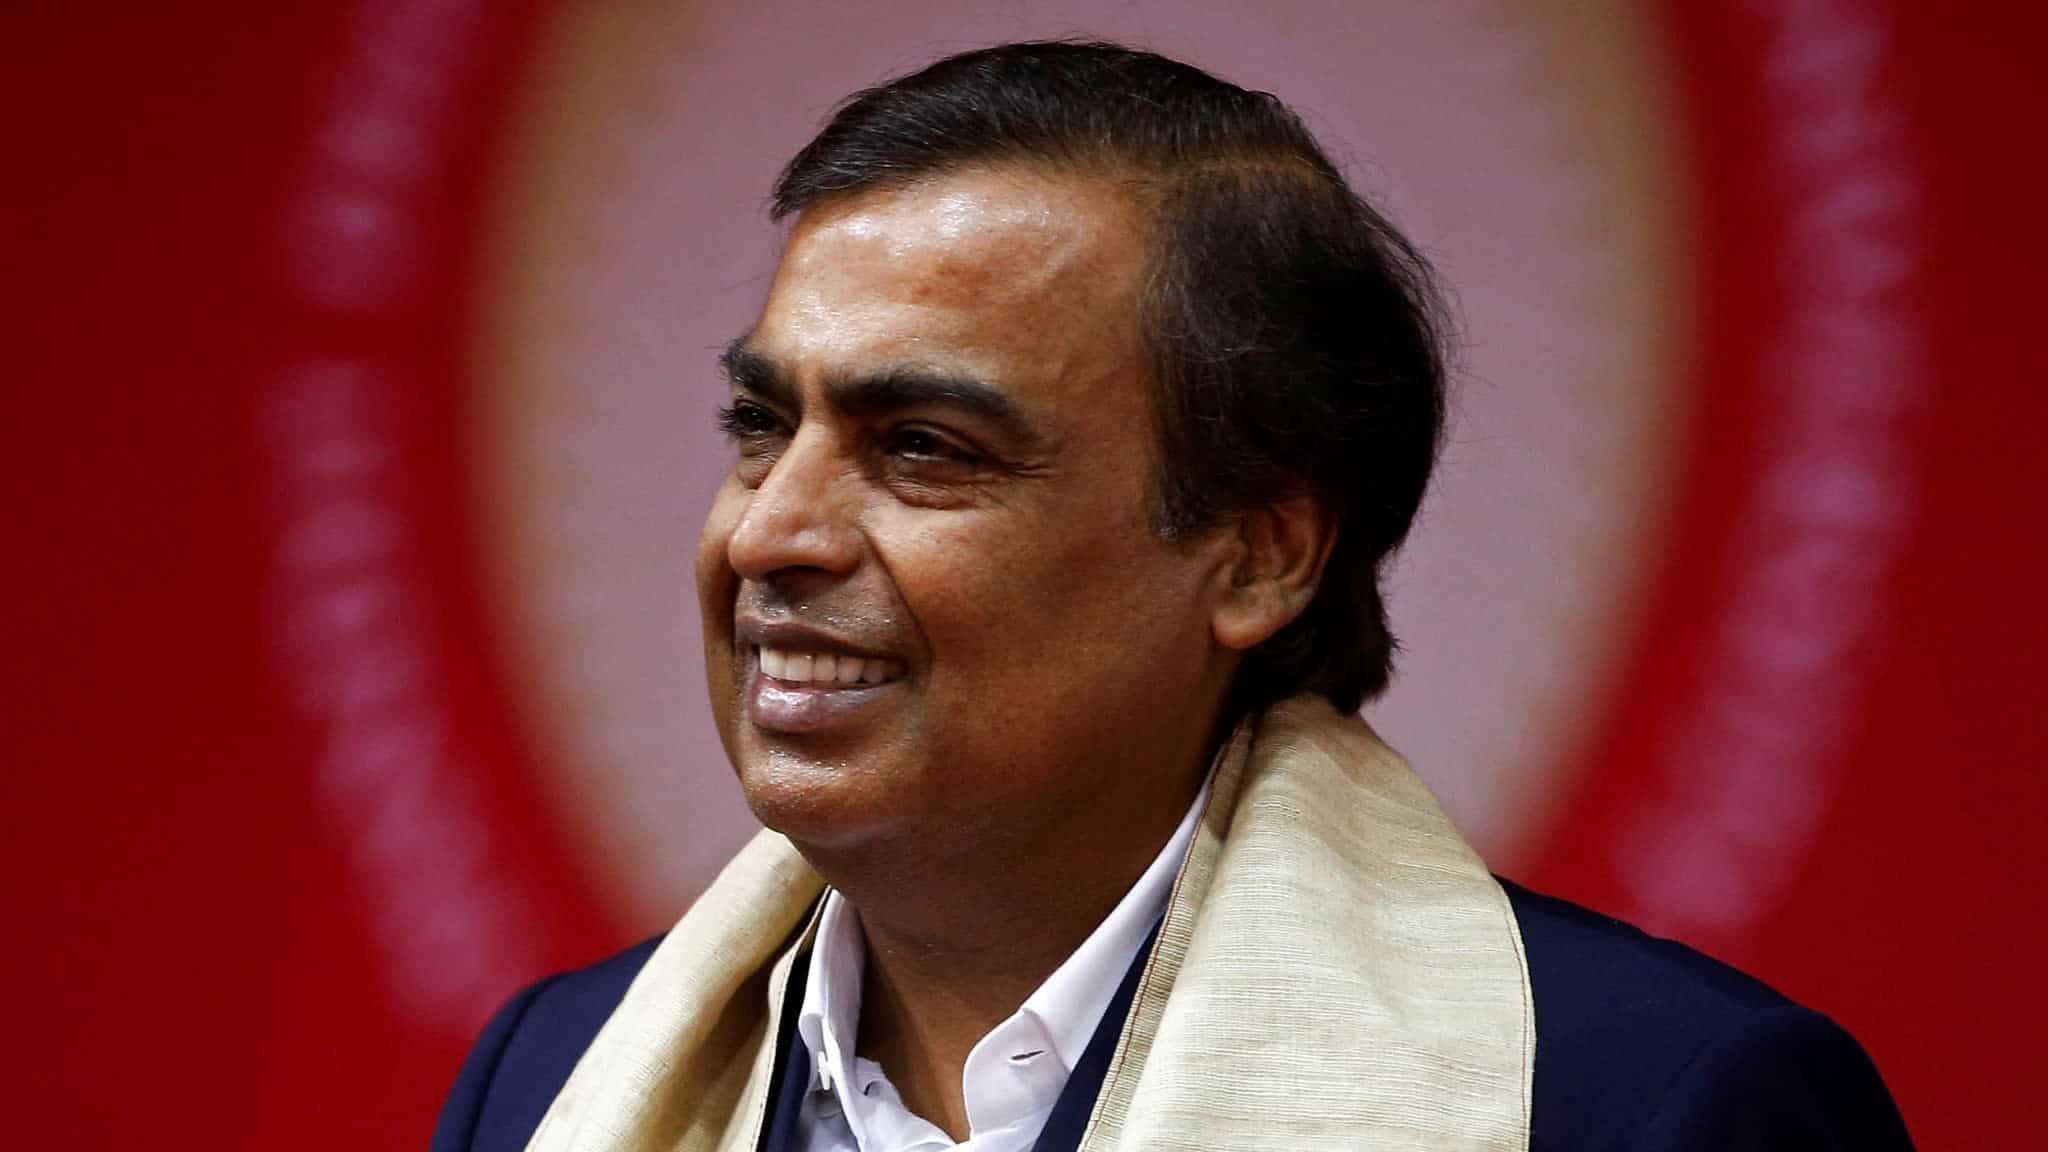 Revealed! Why Mukesh Ambani, Reliance Industries chief, is ...